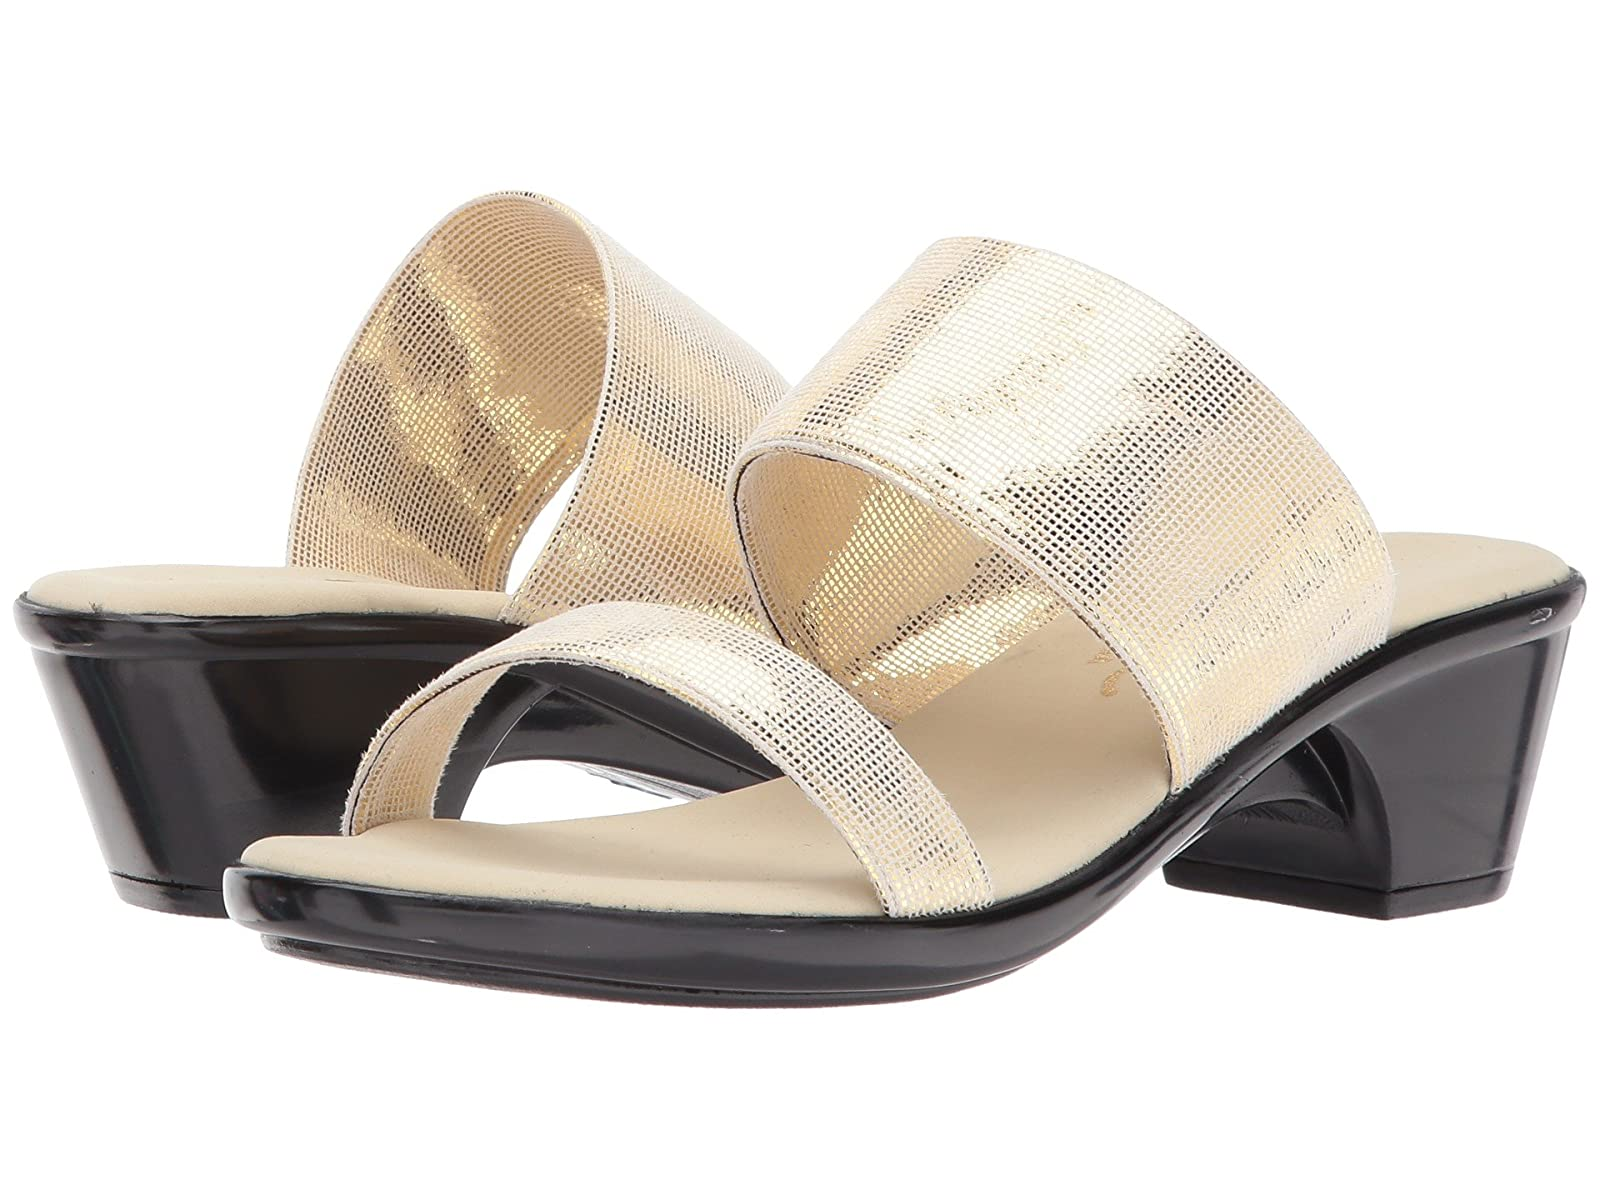 Onex HarperCheap and distinctive eye-catching shoes